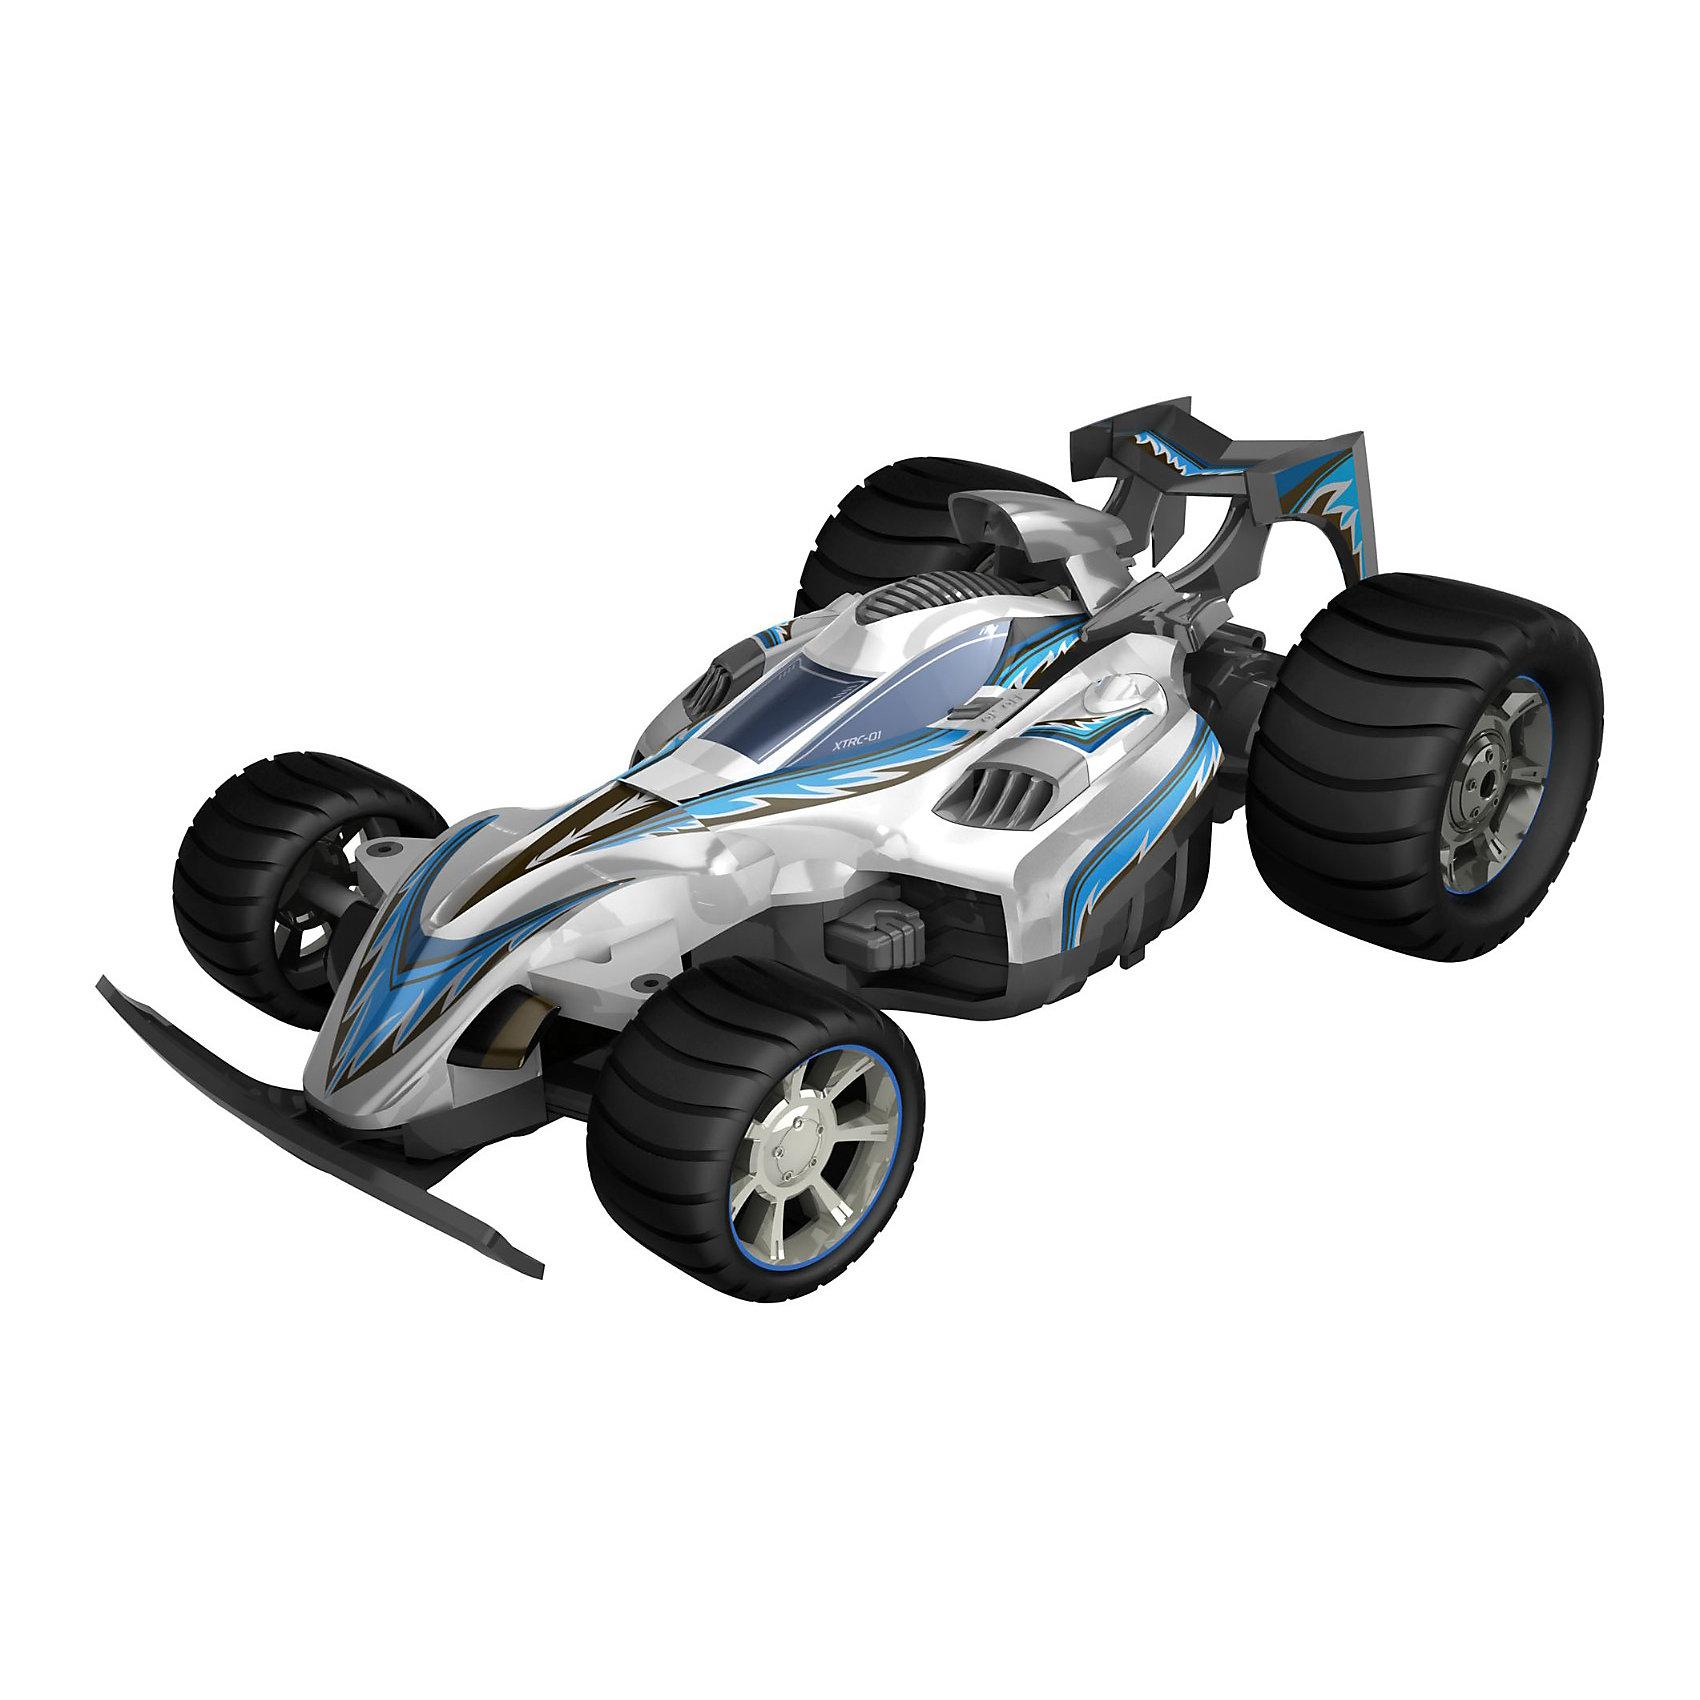 Машина-трансформер Power XTR 3 в 1 на р/у, Silverlit